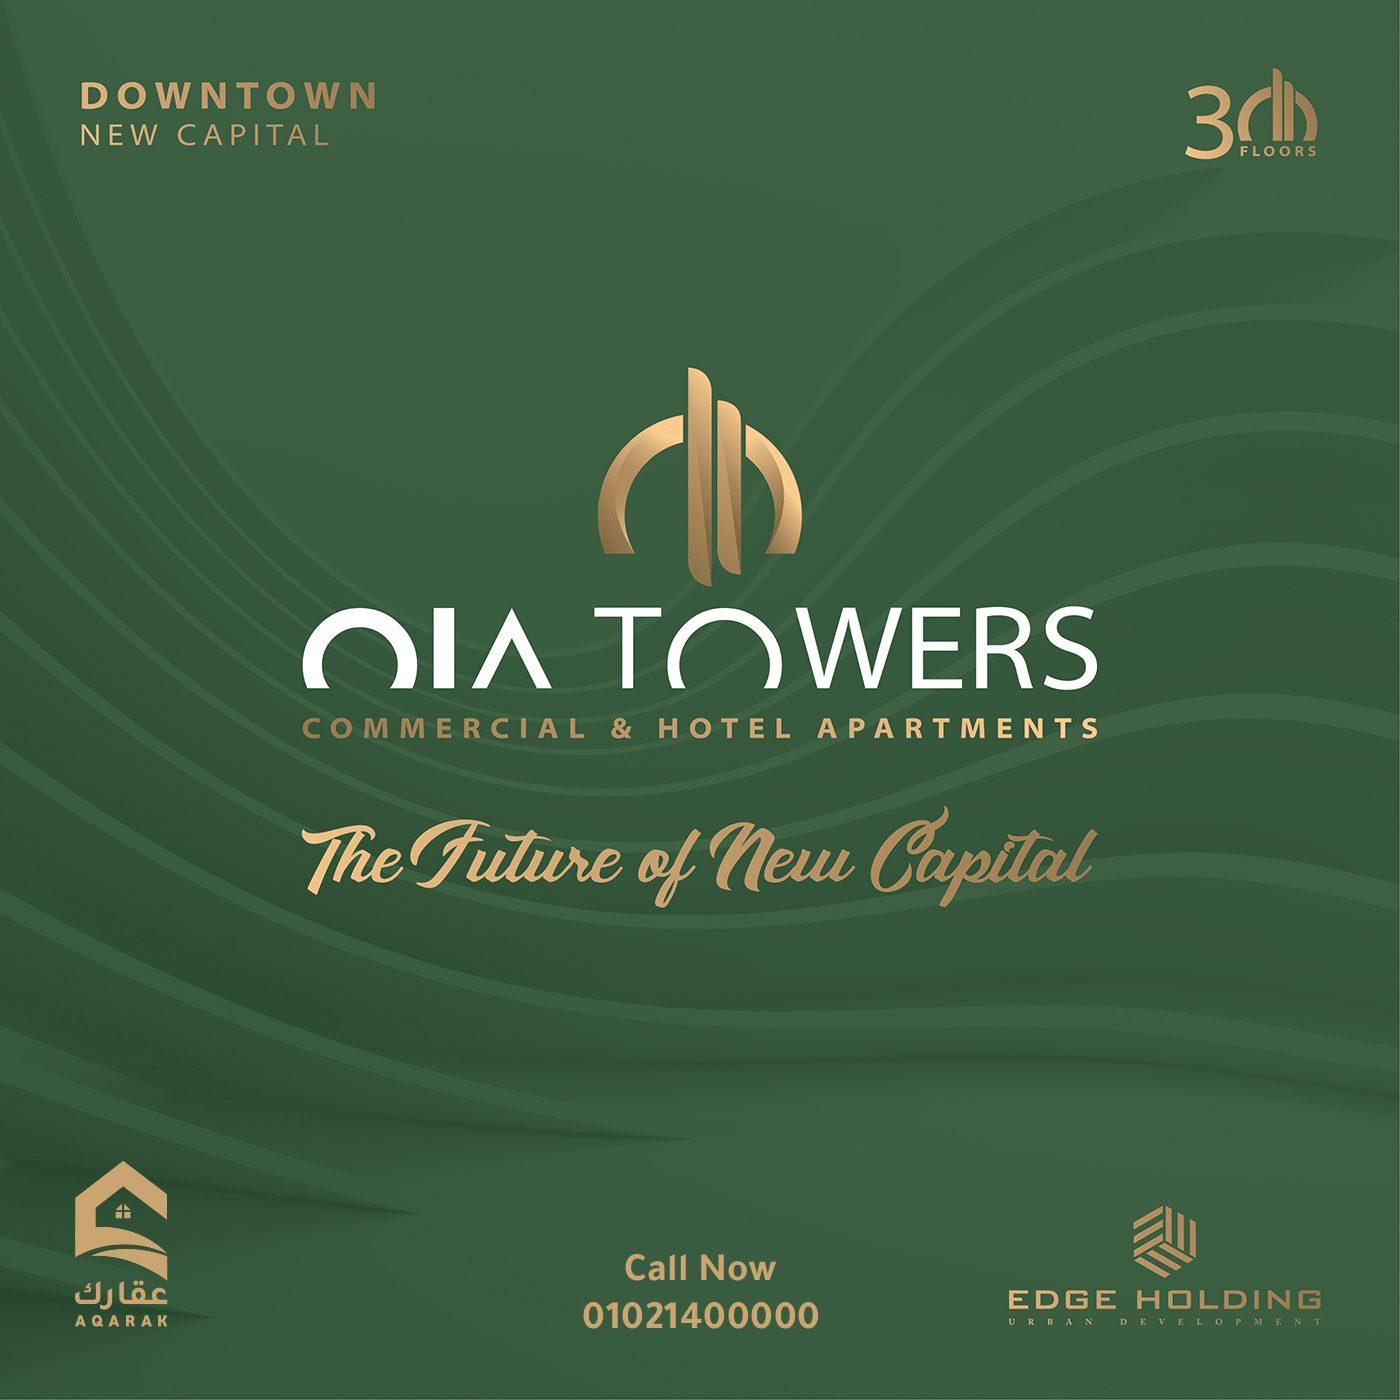 OIA TOWERS